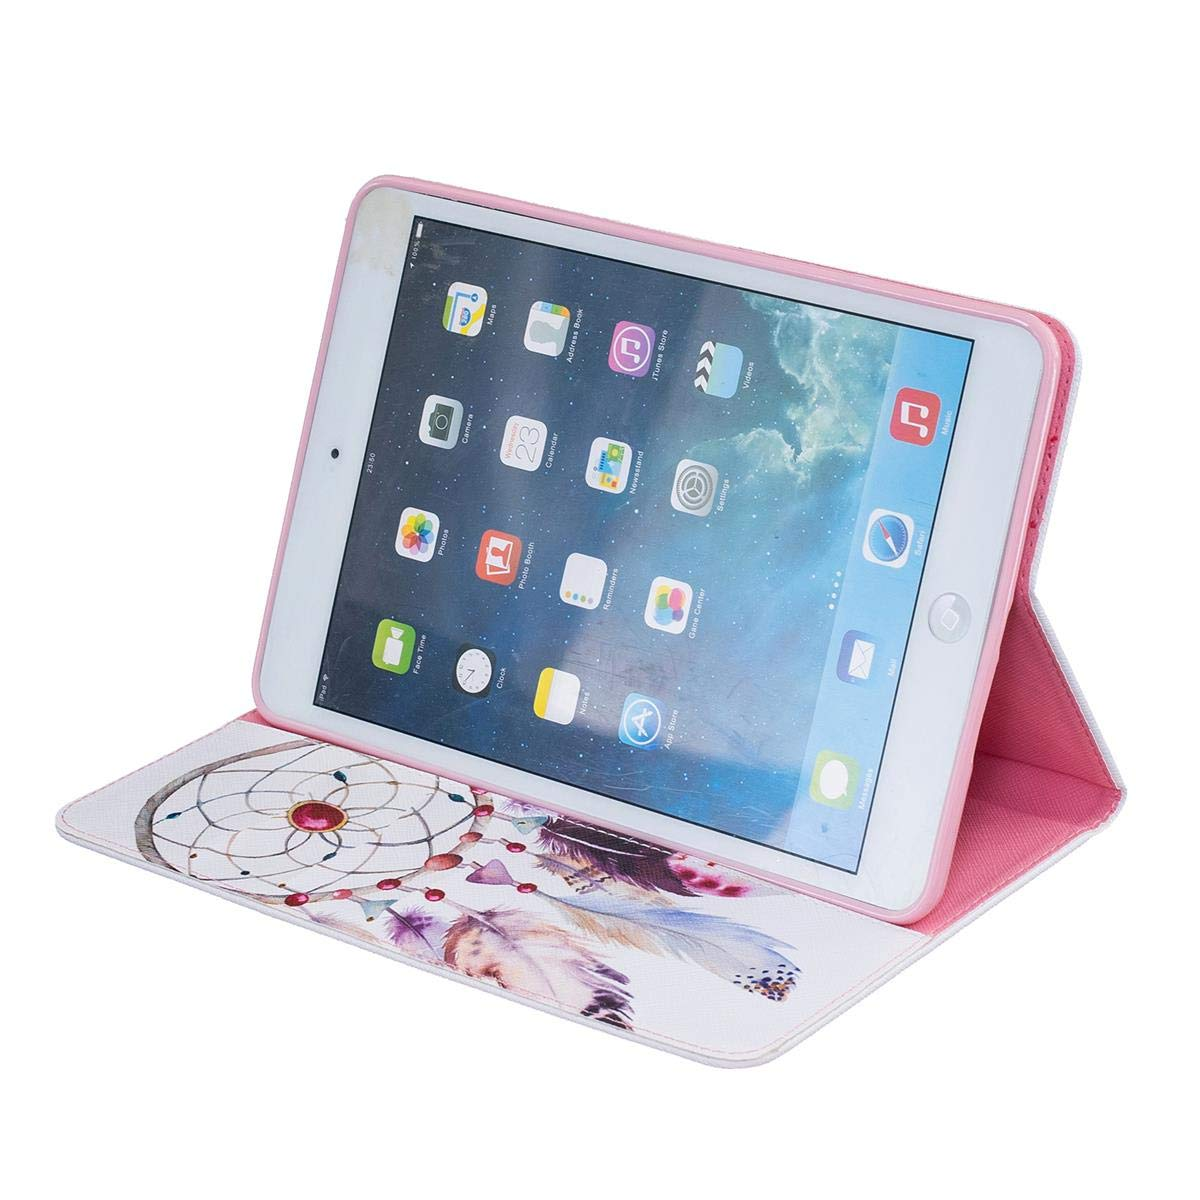 Funda para iPad Mini 1 2 3 Carcasa Silicona Suave Goma Gel PU Cuero con Soporte Funci/ón Hola Panda